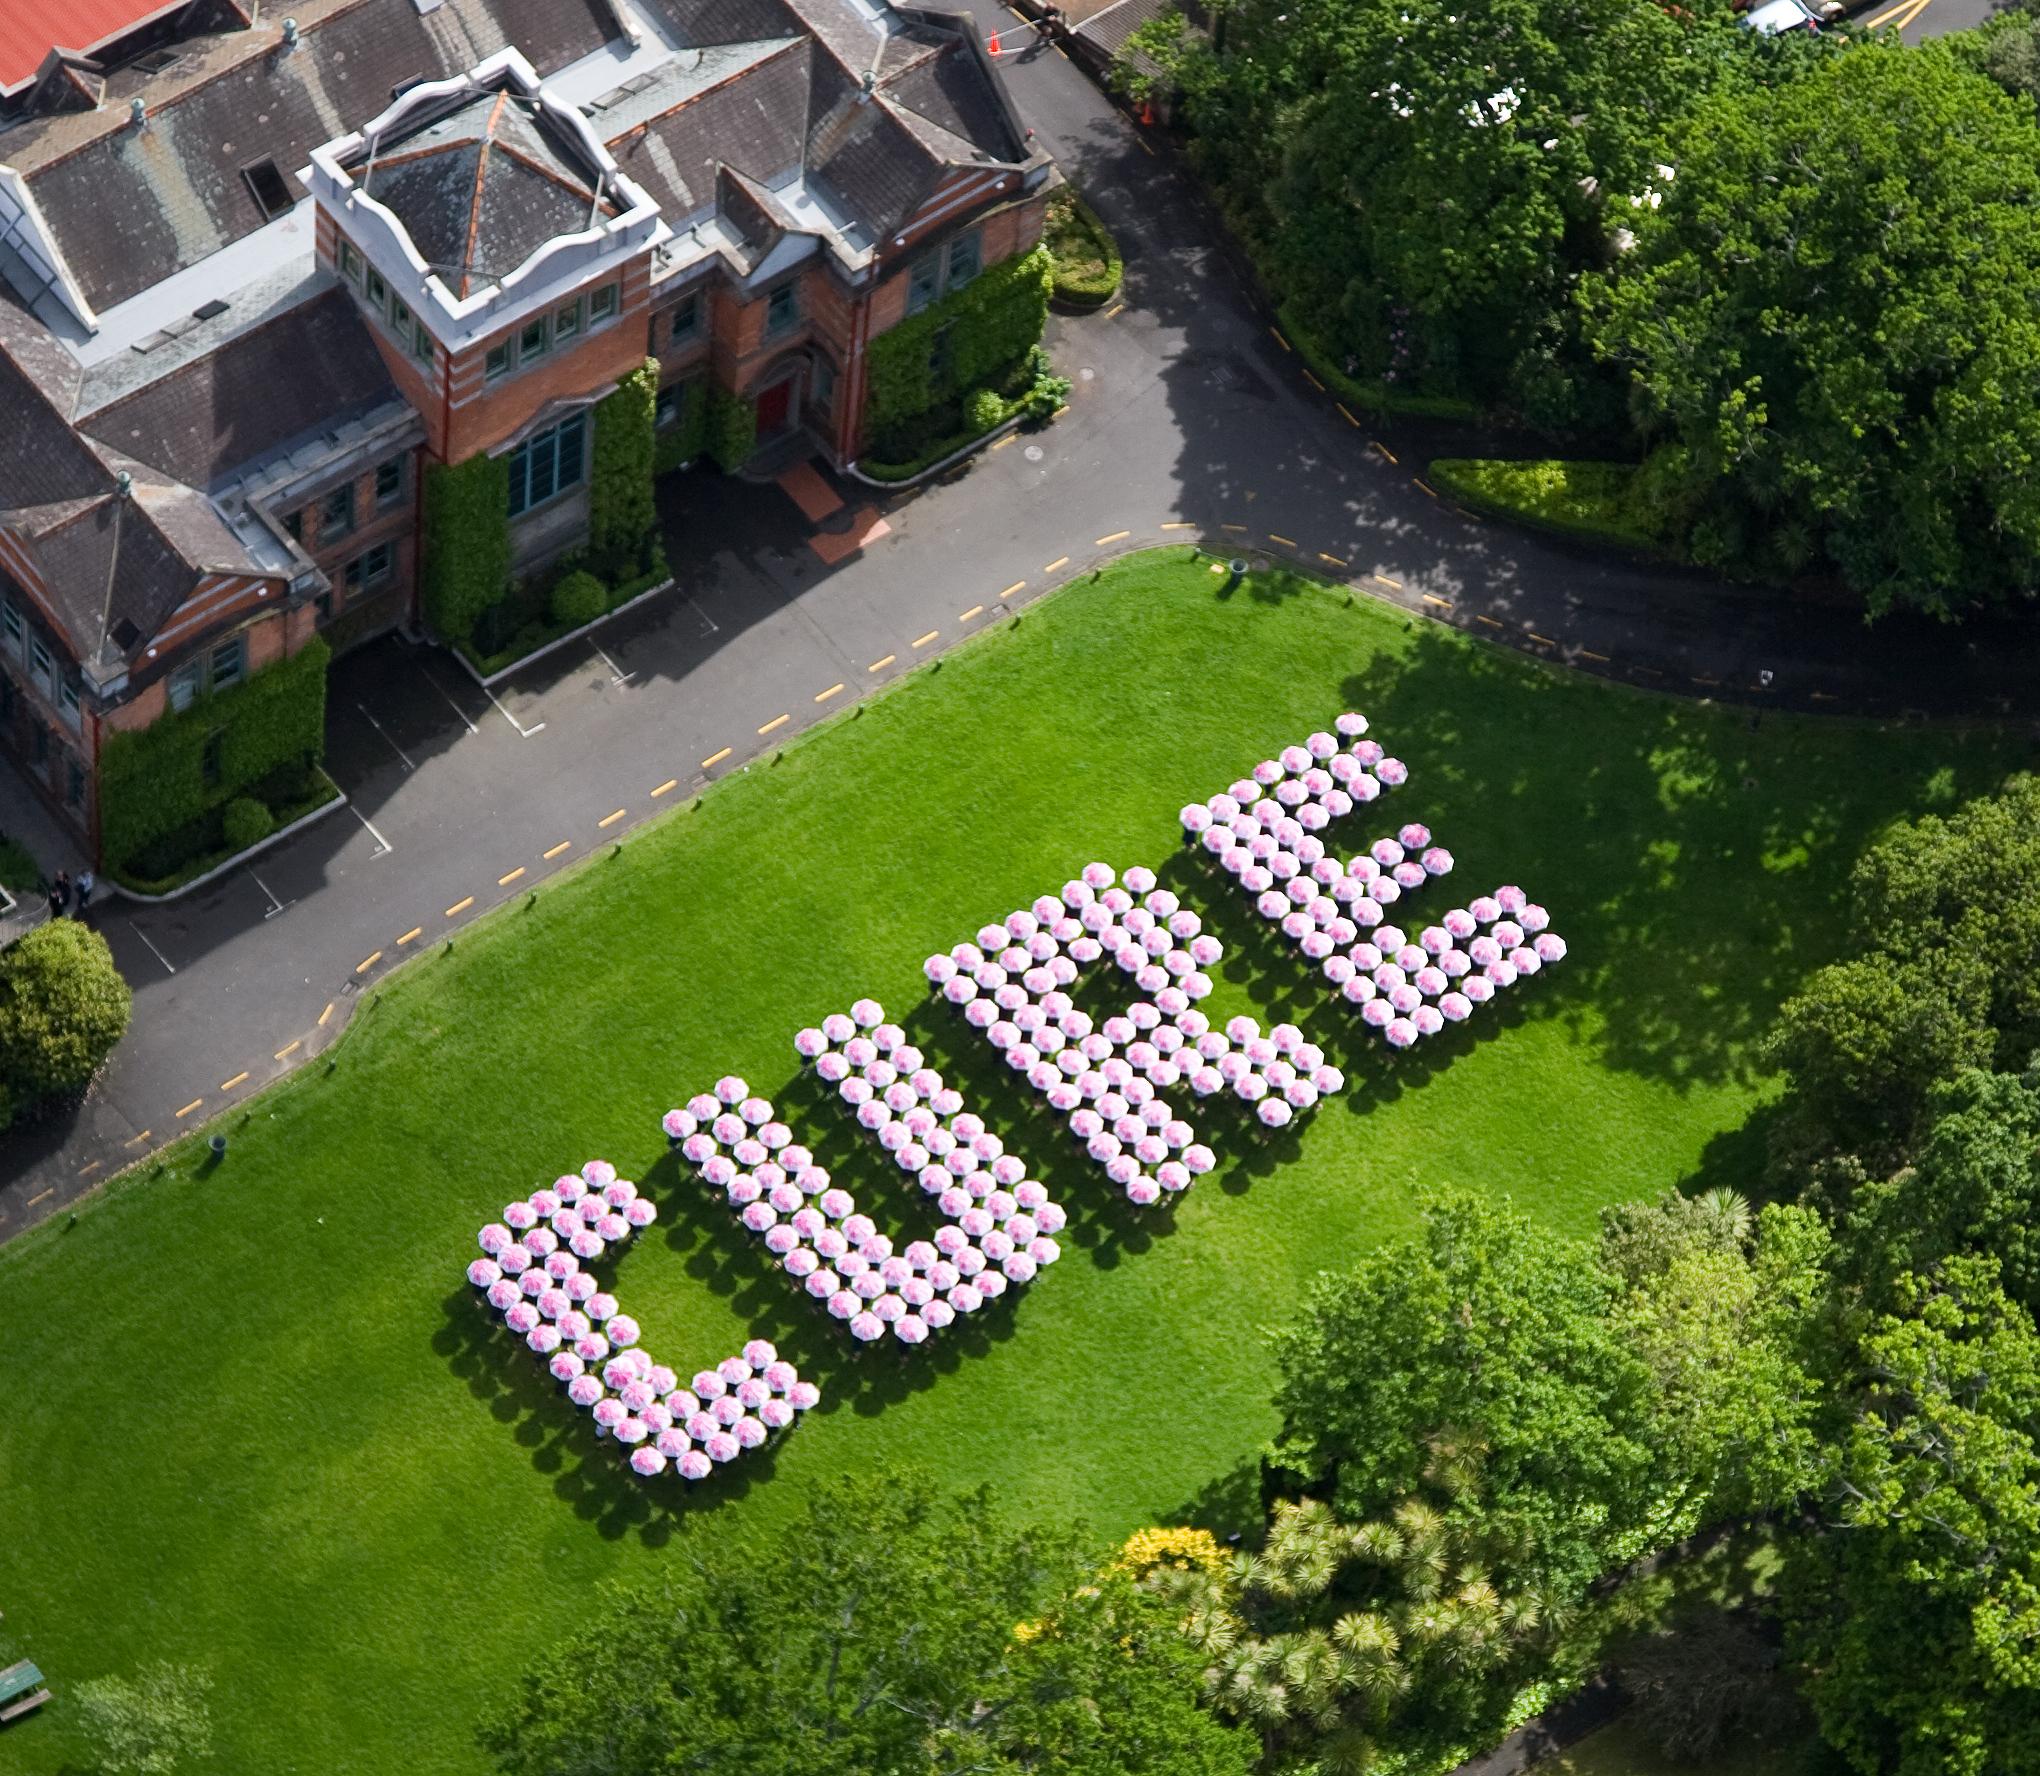 'CURE' AT AUCKLAND GIRLS GRAMMAR SCHOOL